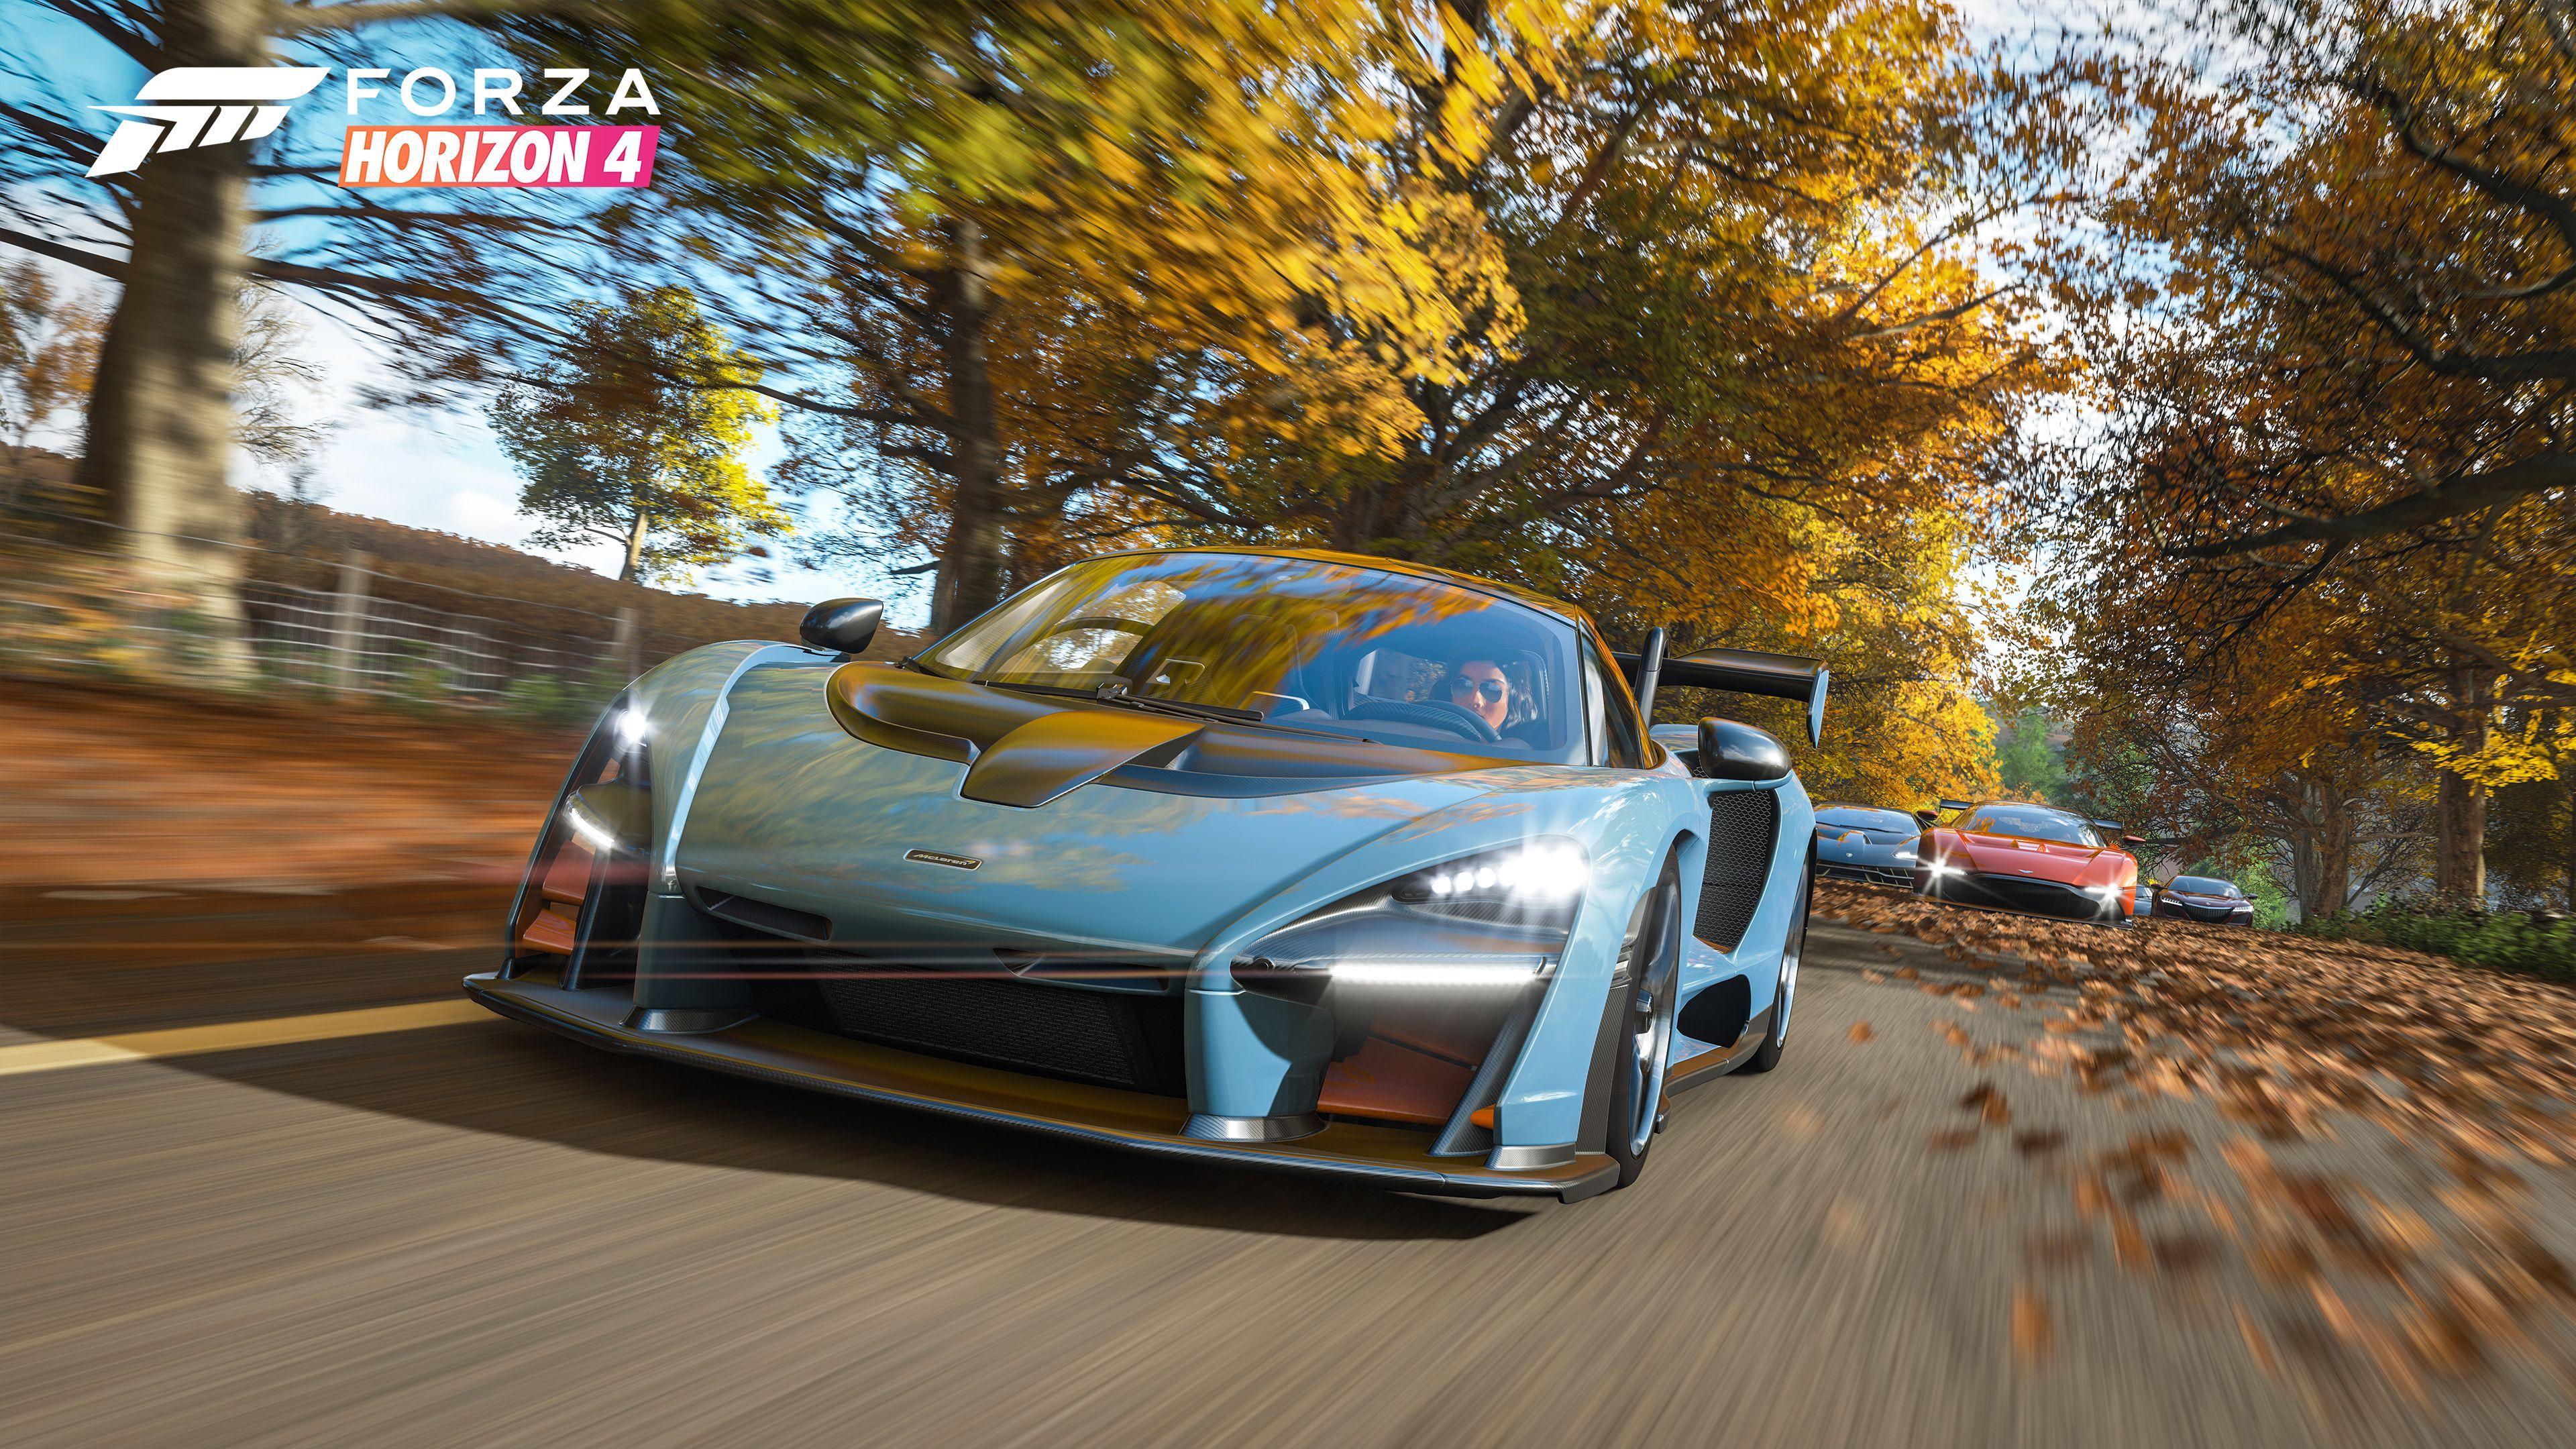 Forza Horizon 4: Ultimate (Microsoft Studios) (RUS|ENG|MULTi)